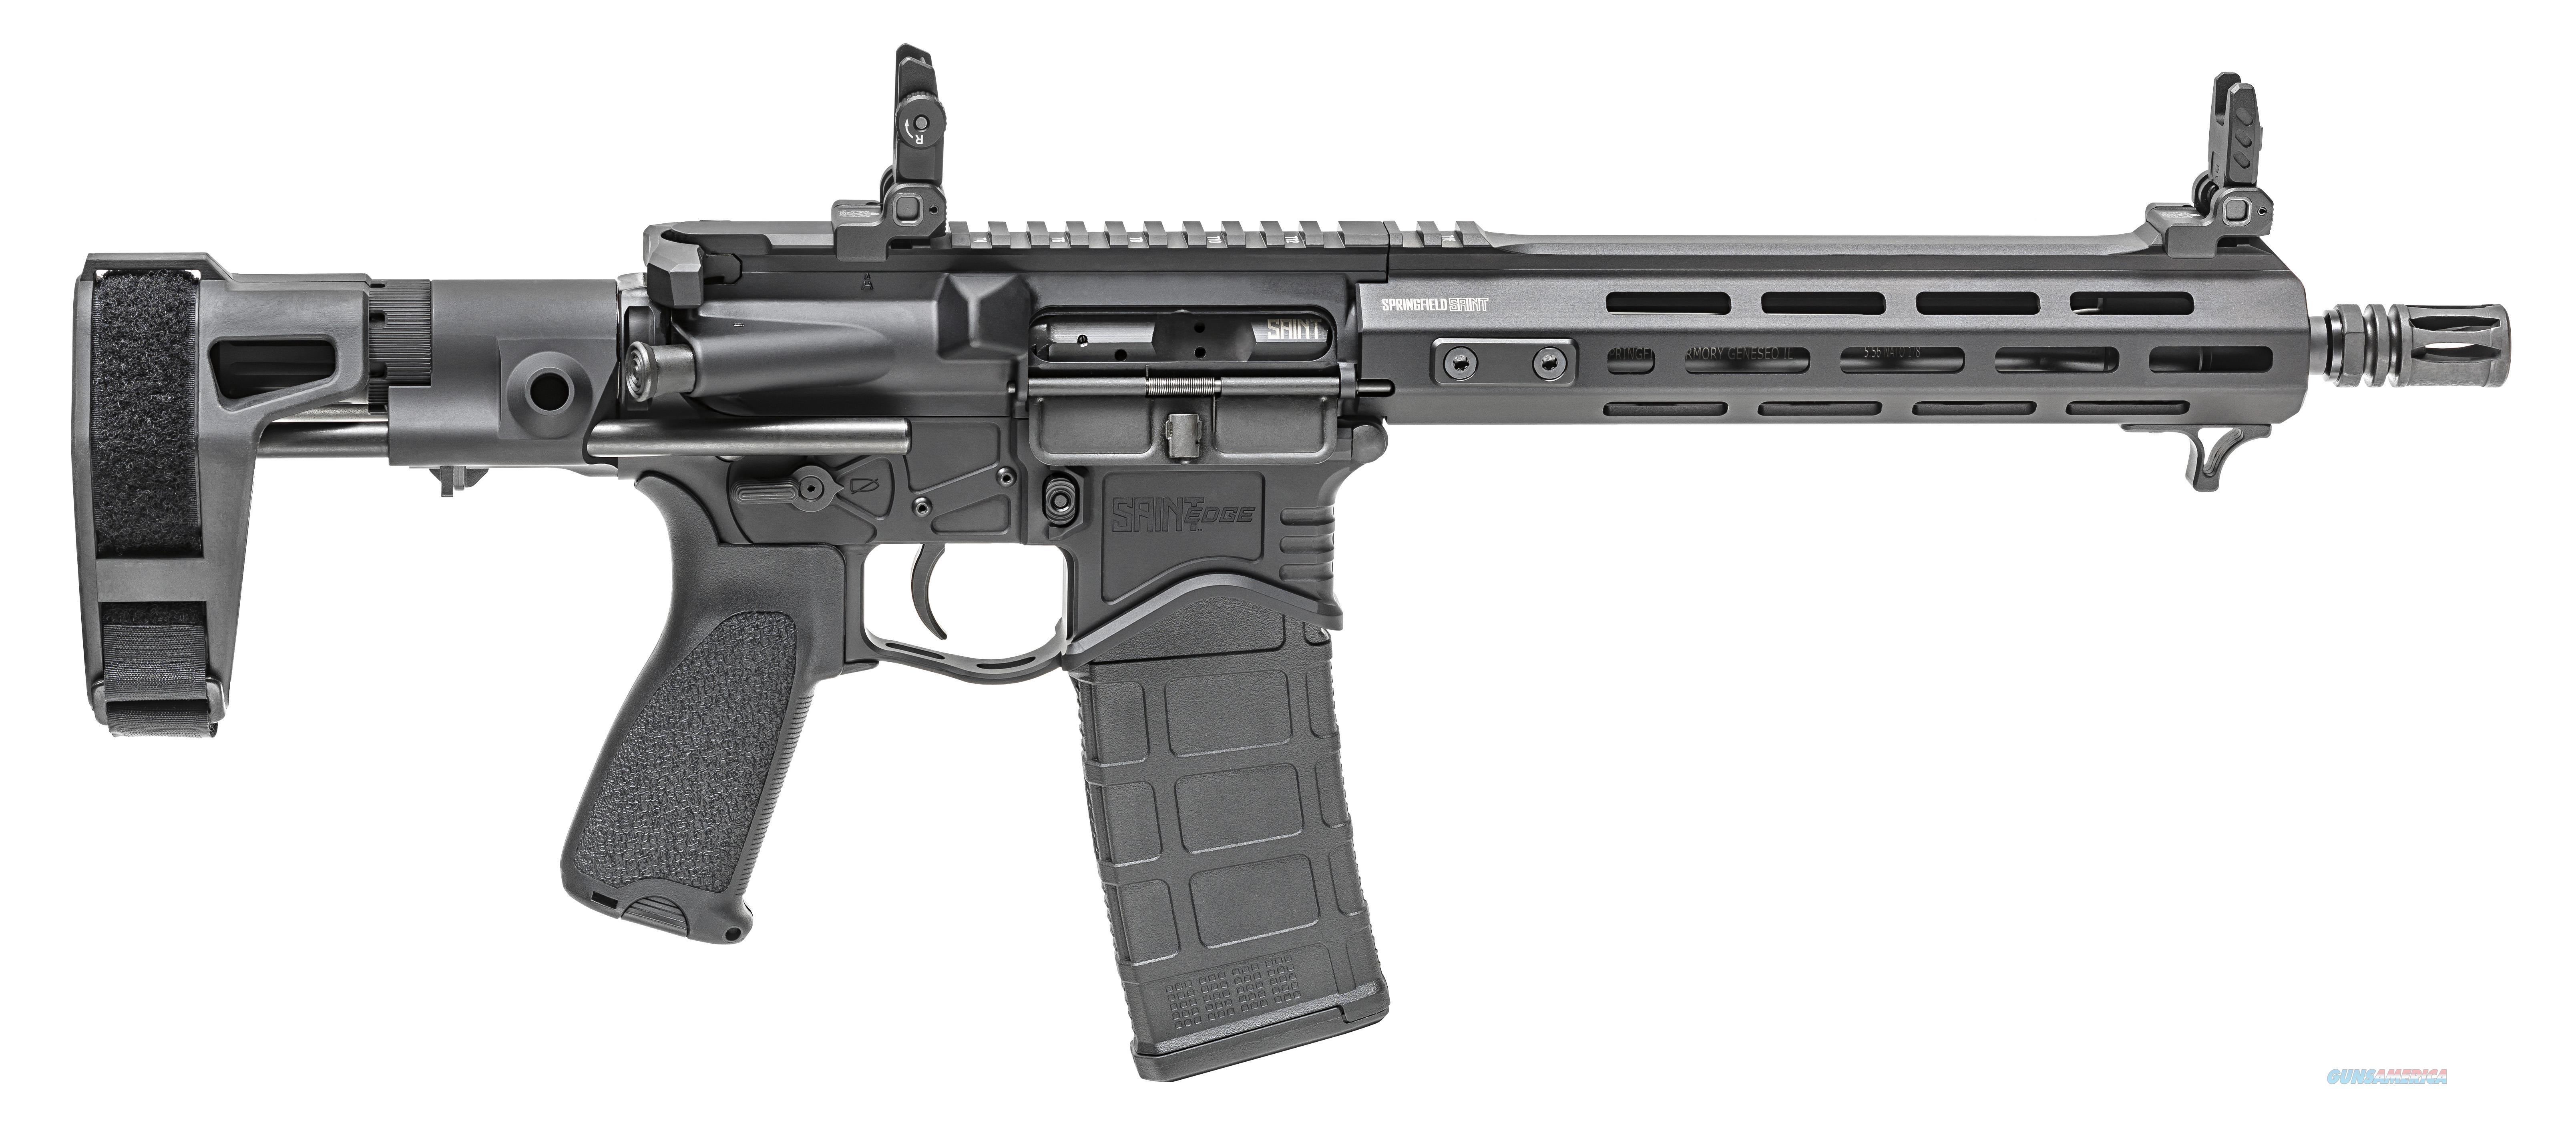 "Springfield Saint Edge AR-15 Pistol 5.56 NATO 10.3"" STE9103556B   Guns > Pistols > Springfield Armory Pistols > SAINT Pistol"